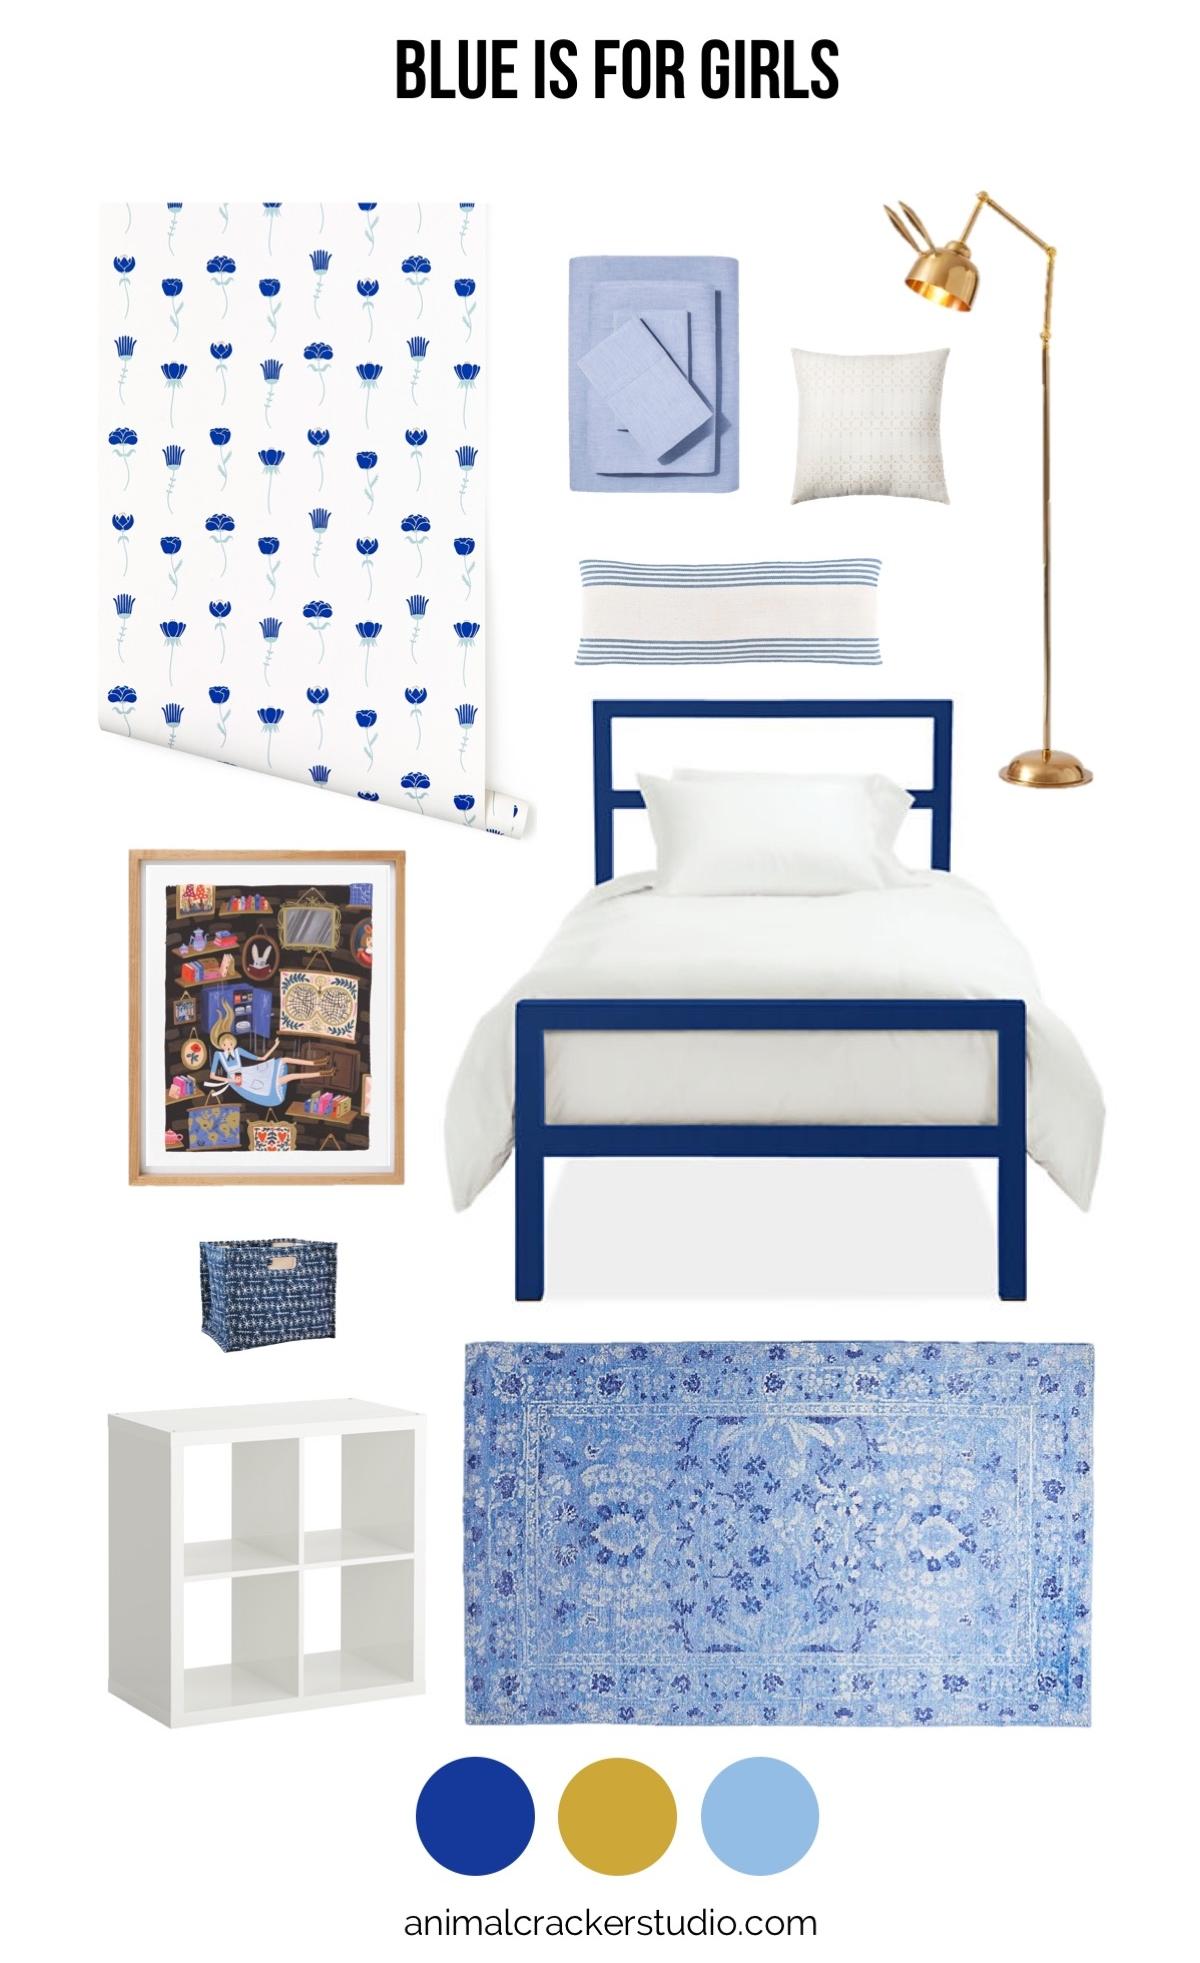 Sources:  wallpaper ,  sheets ,  square eyelet pillow ,  boudoir pillow ,  lamp ,  bed ,  rug ,  bookshelf ,  similar bin ,  Alice Falling ,  frame .